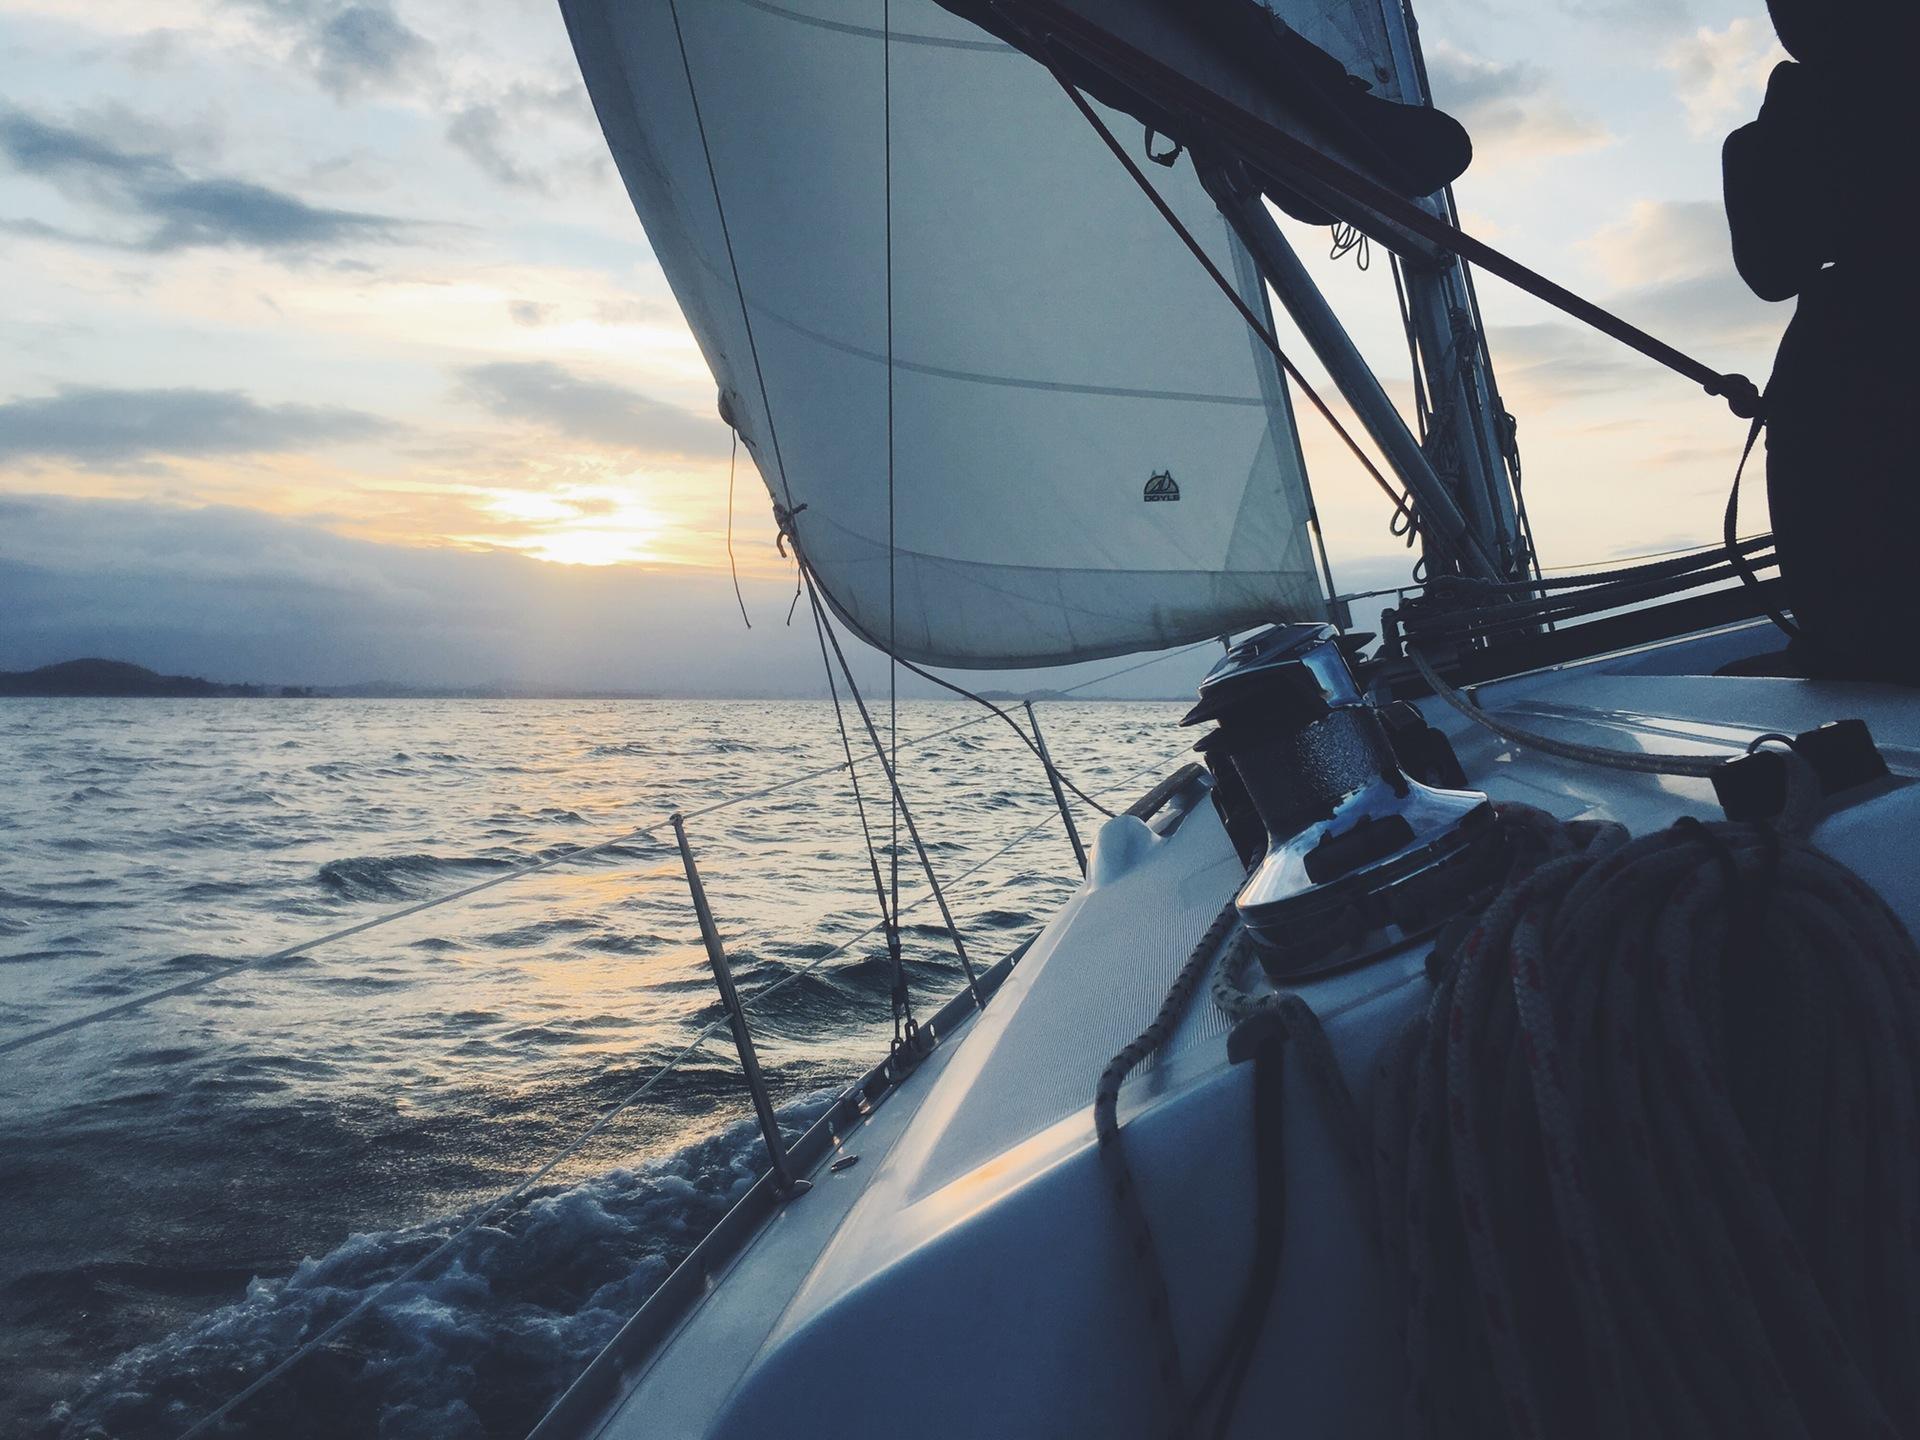 Yacht, Meer, Durchsuchen, Ozean, Kreuzfahrt - Wallpaper HD - Prof.-falken.com